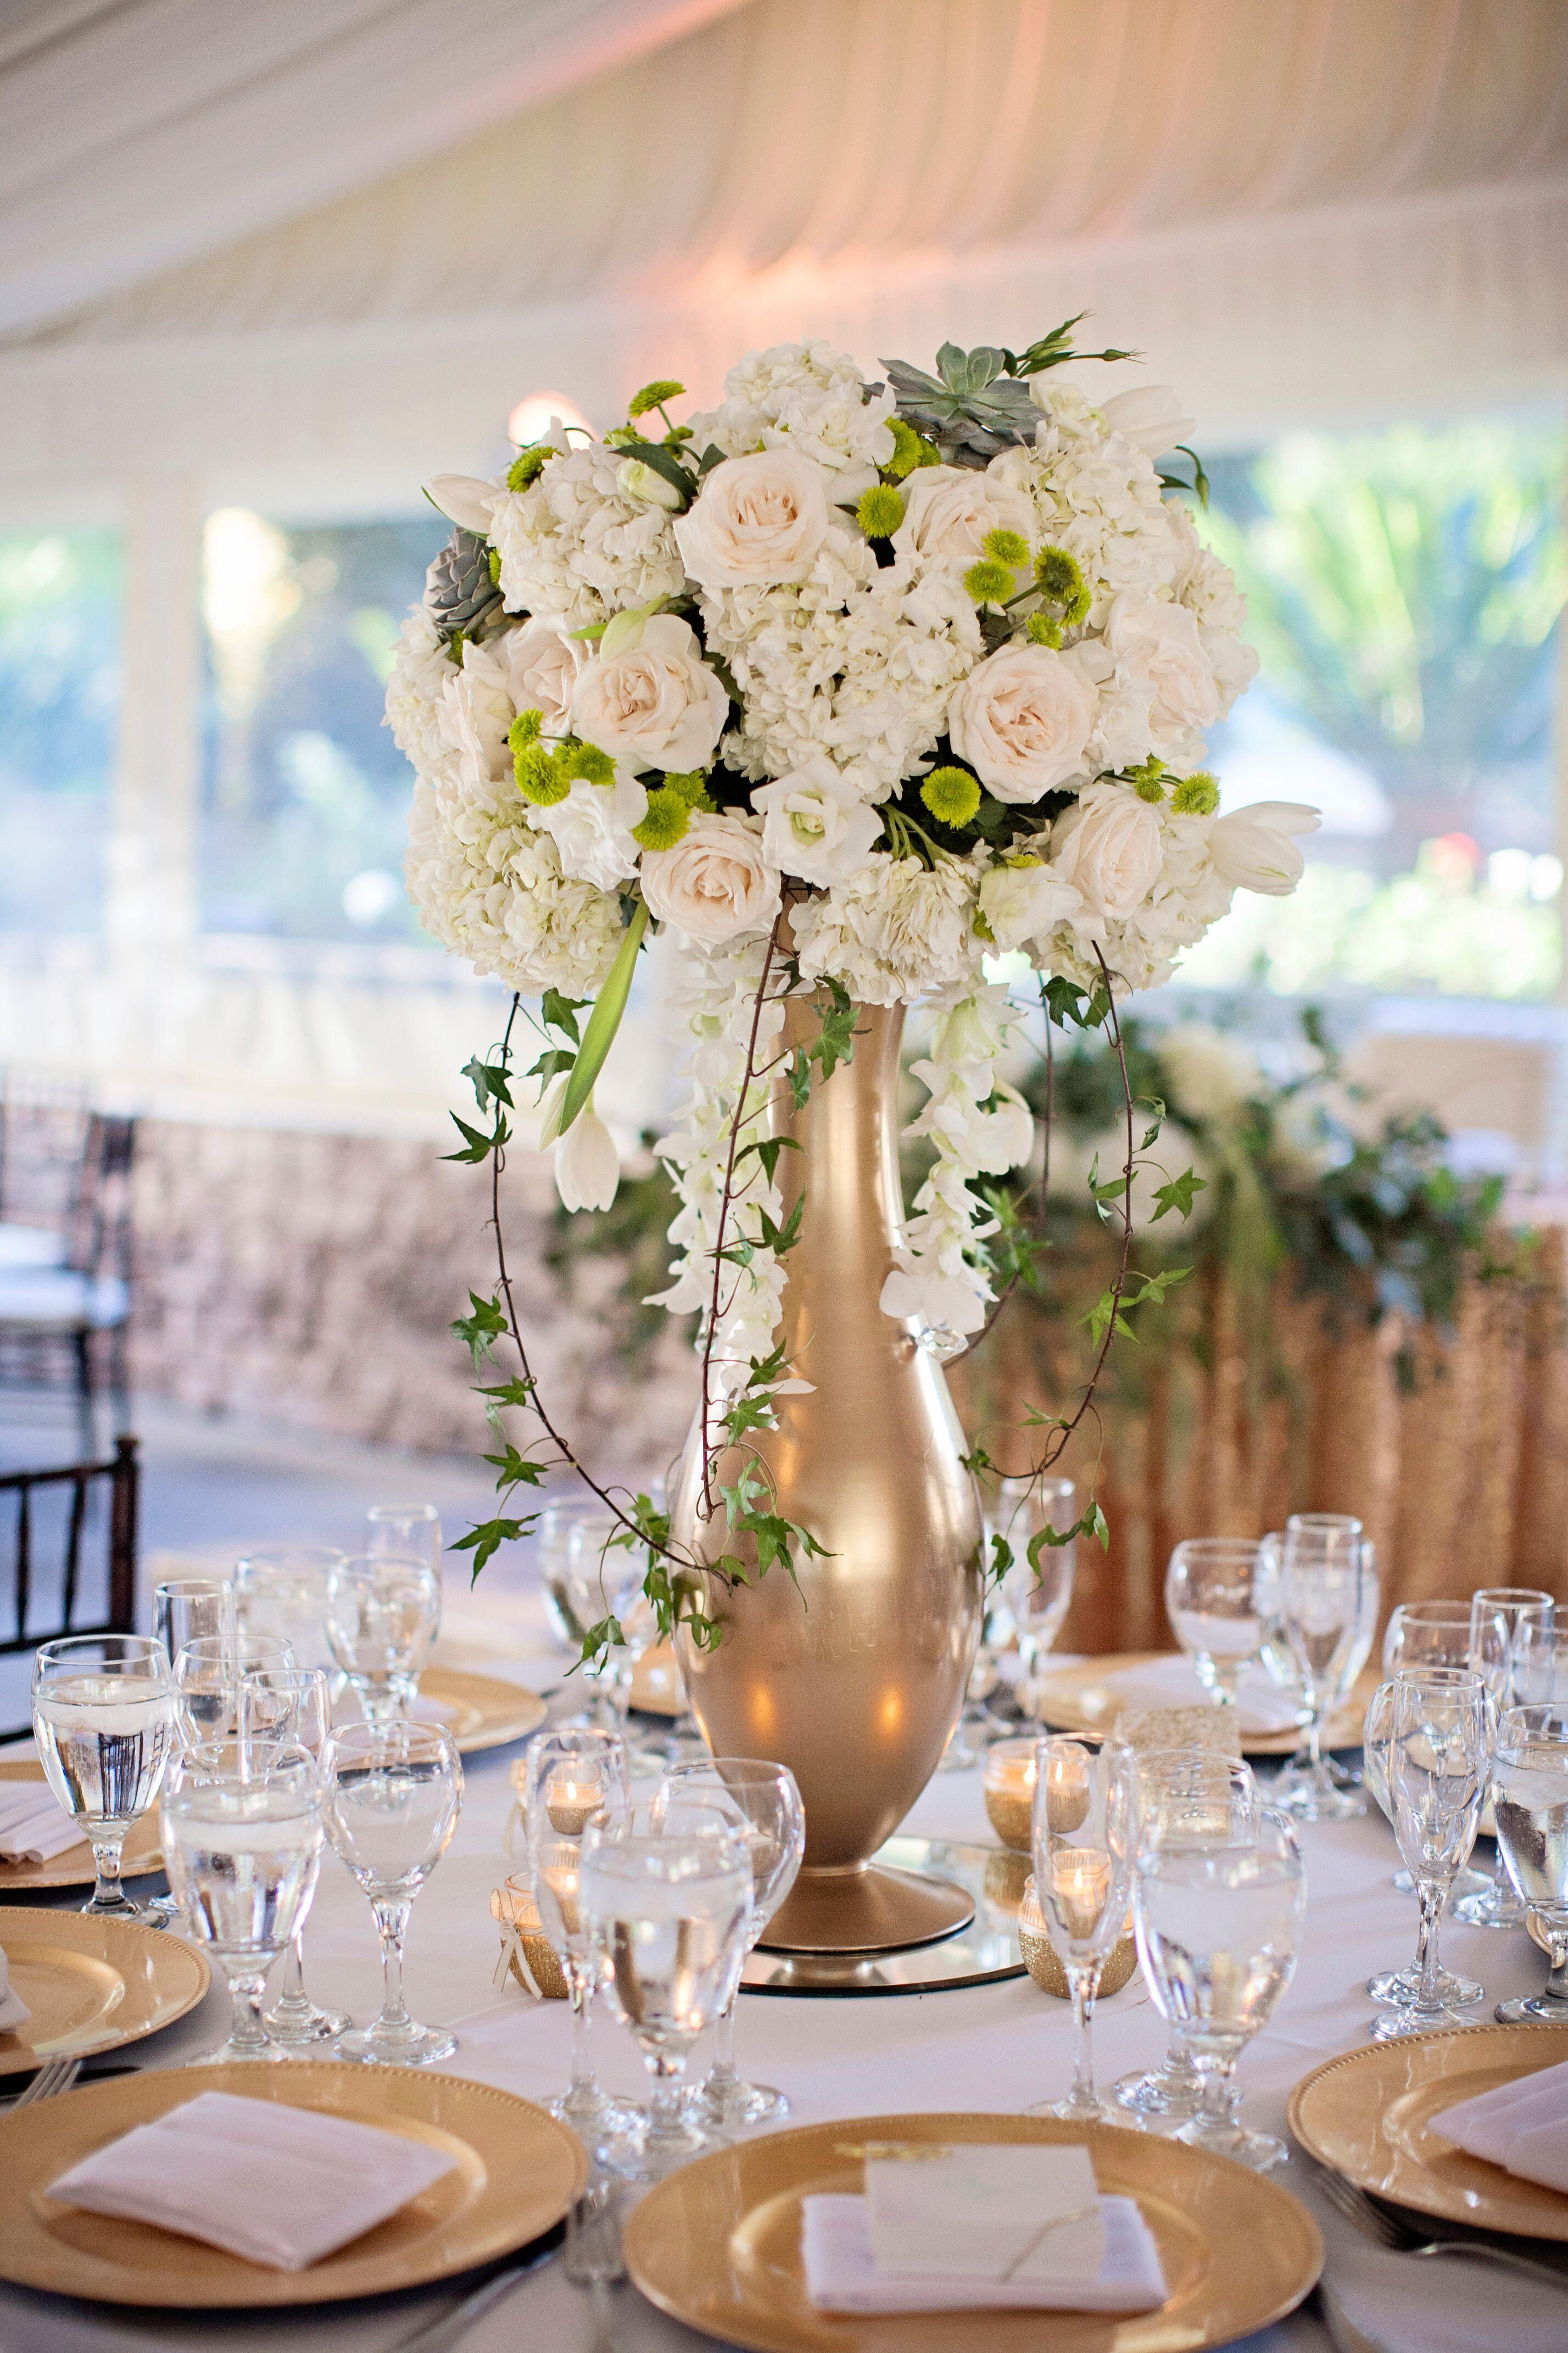 Romantic Hotel Room Ideas: Romantic Floral Centerpieces In Gold Vases